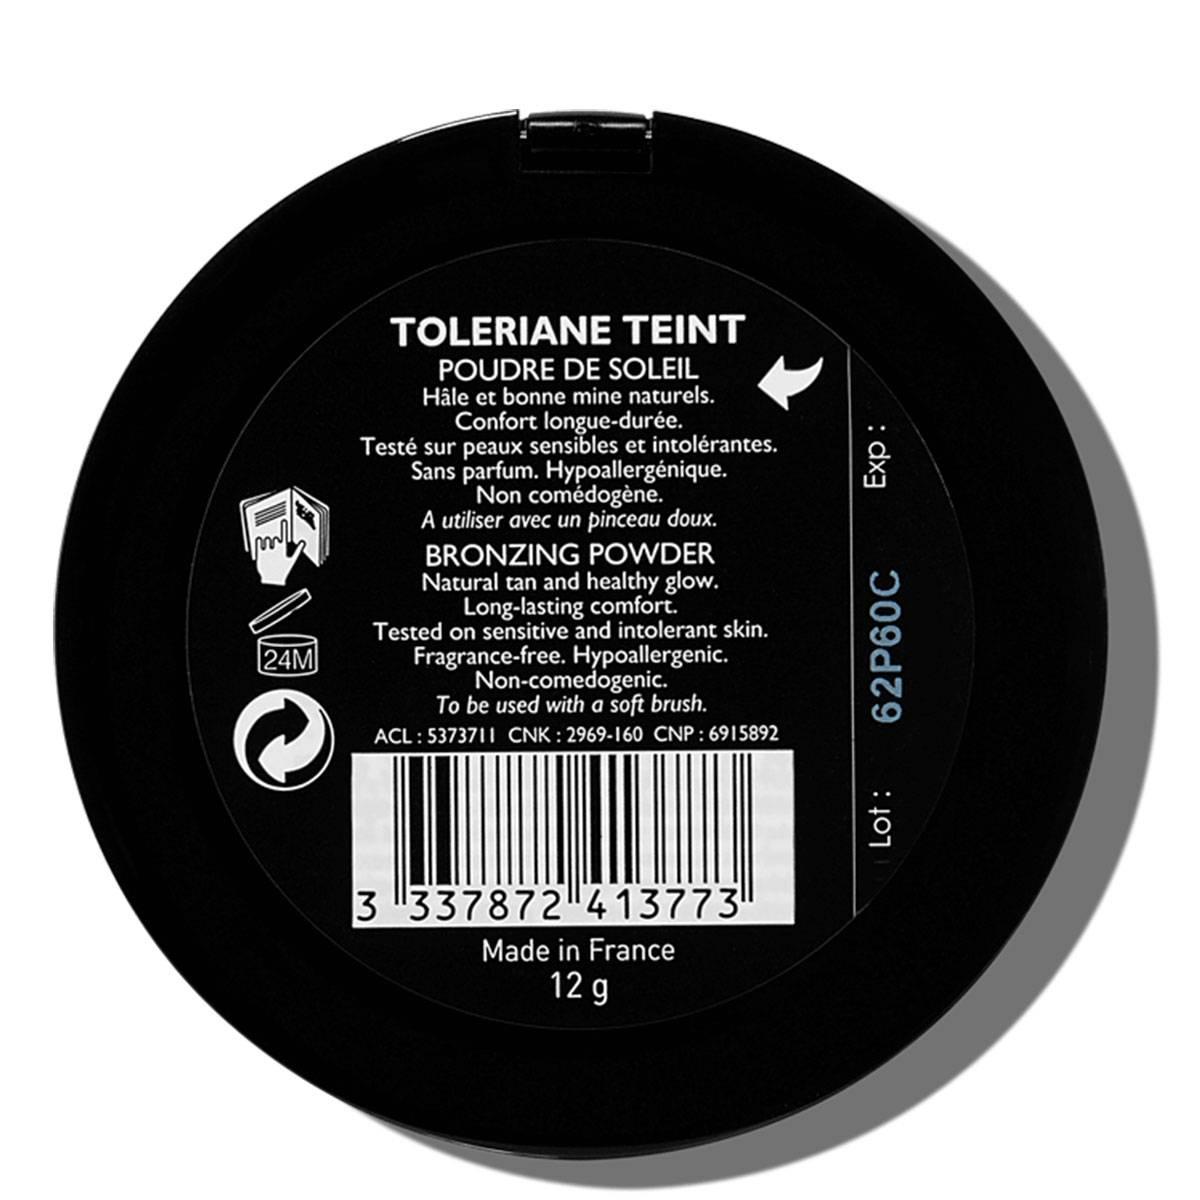 La Roche Posay Sensitive Toleriane Make up TEINT_SunPowder 33378724137